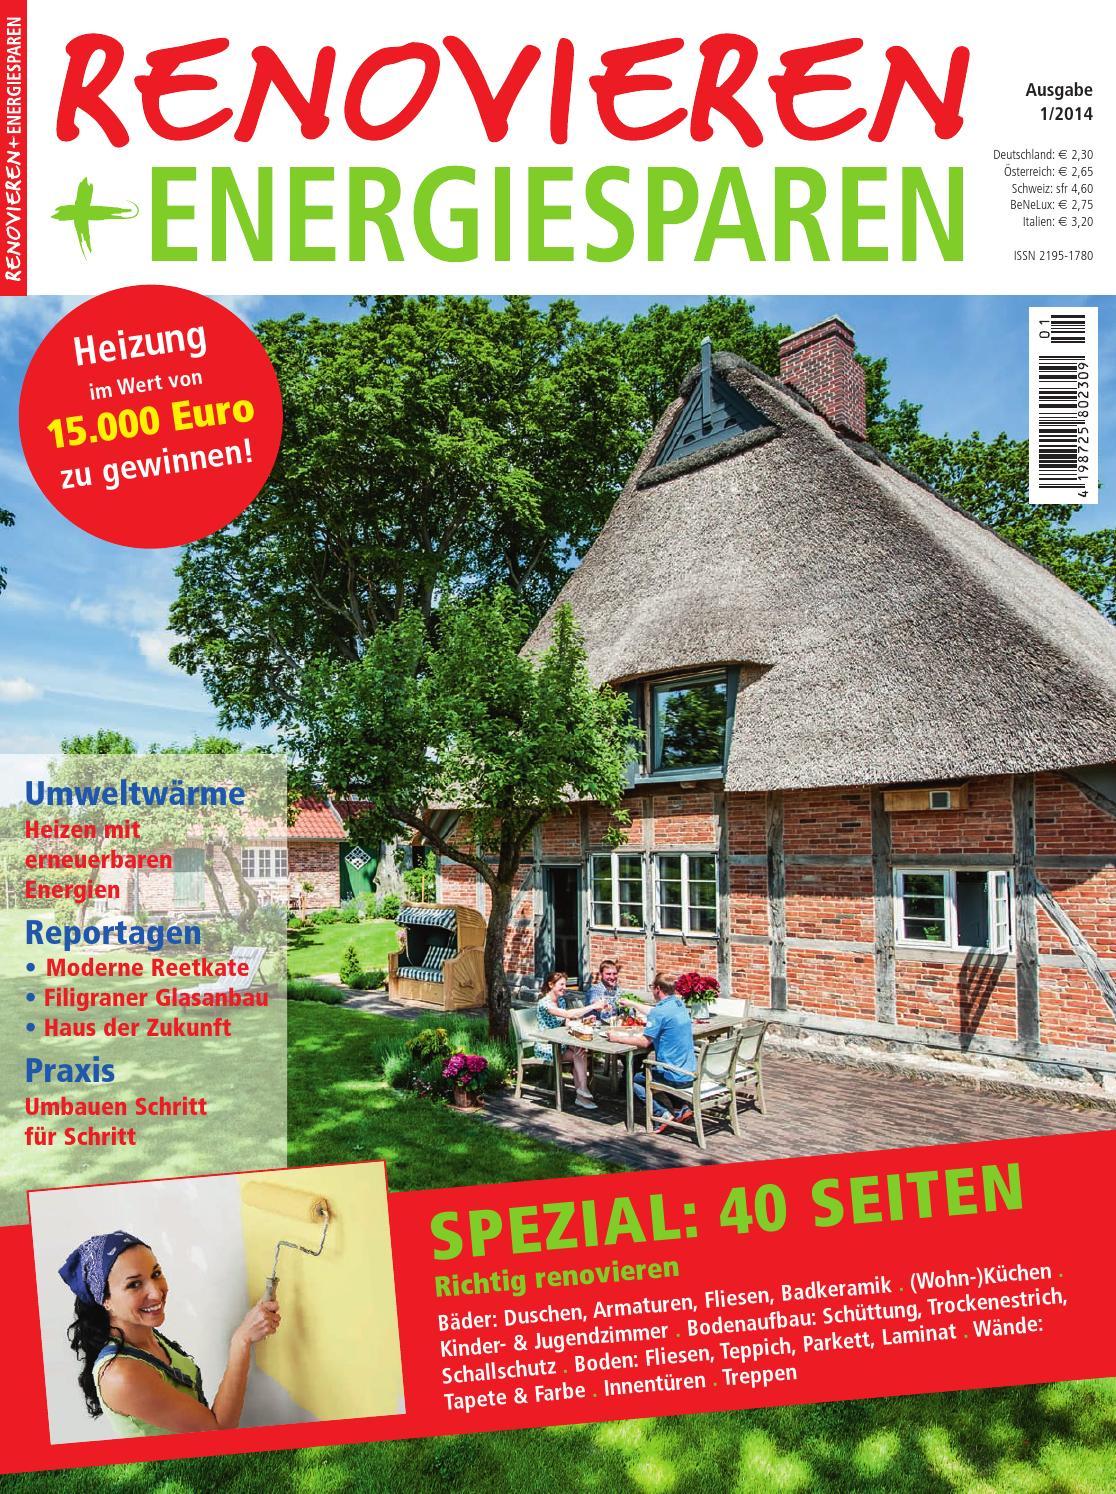 Renovieren & Energiesparen 1 / 2014 by Family Home Verlag GmbH - issuu